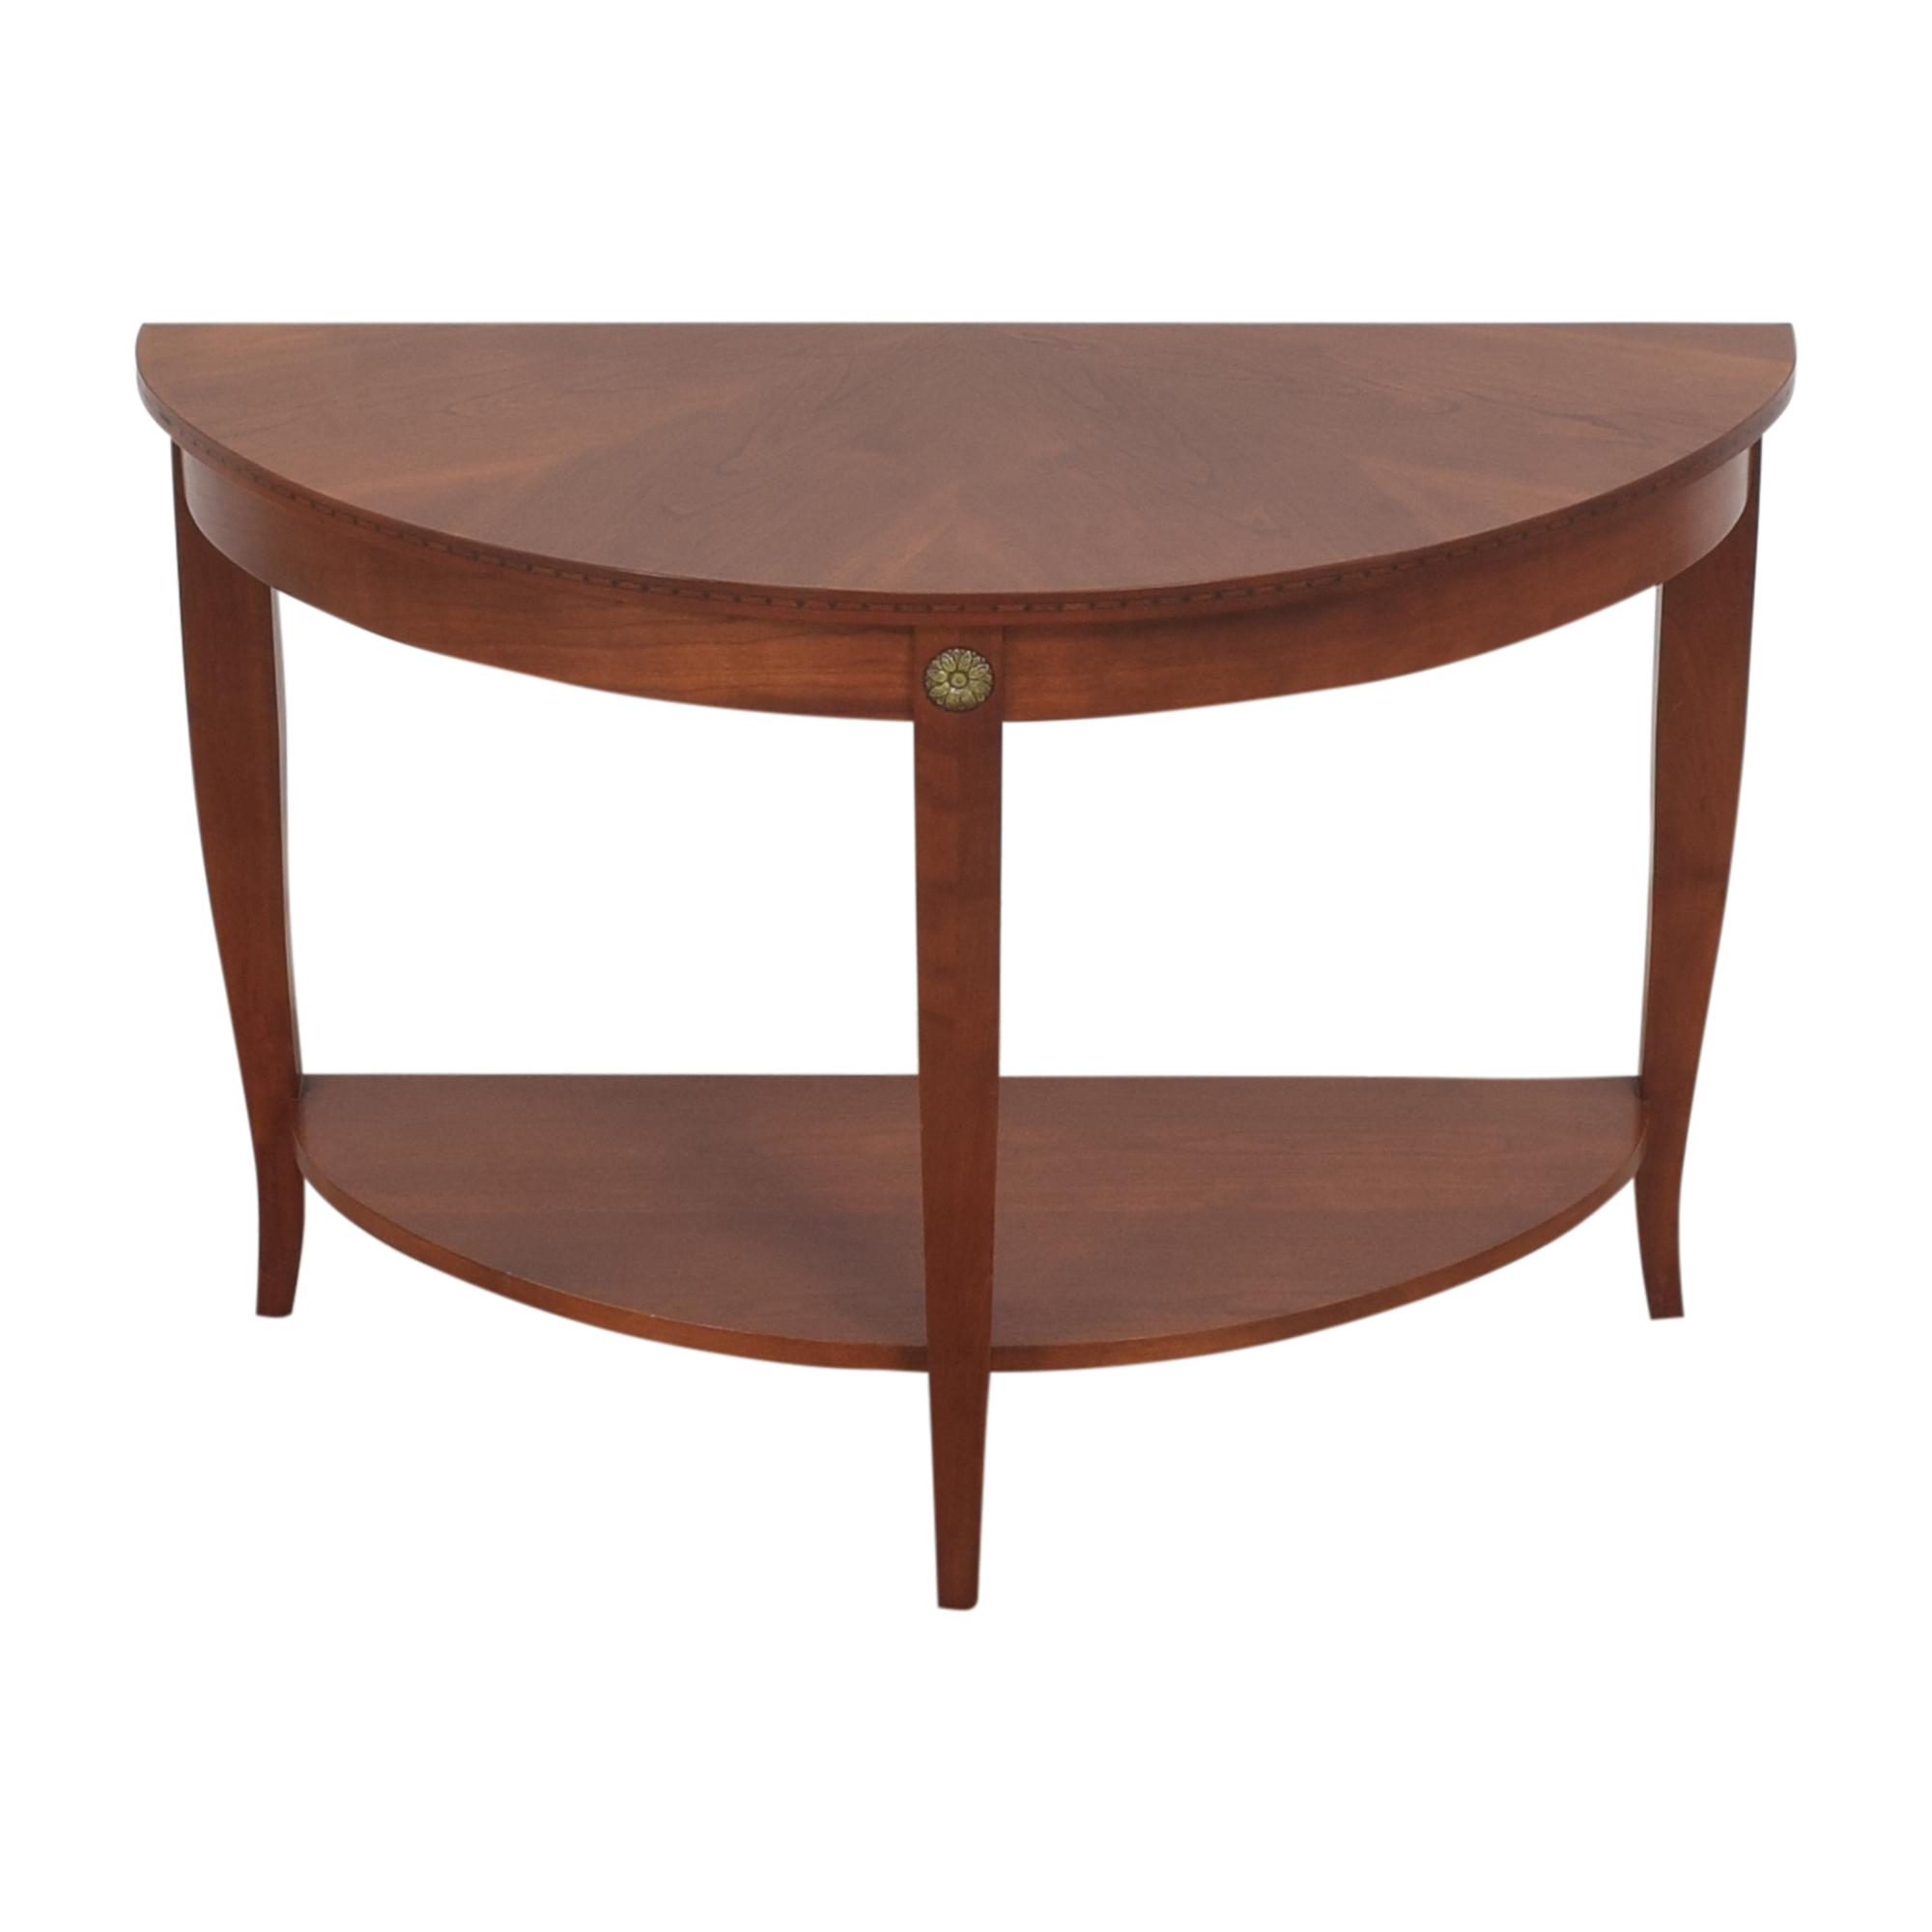 buy Ethan Allen Medallion Crescent Console Table Ethan Allen Accent Tables